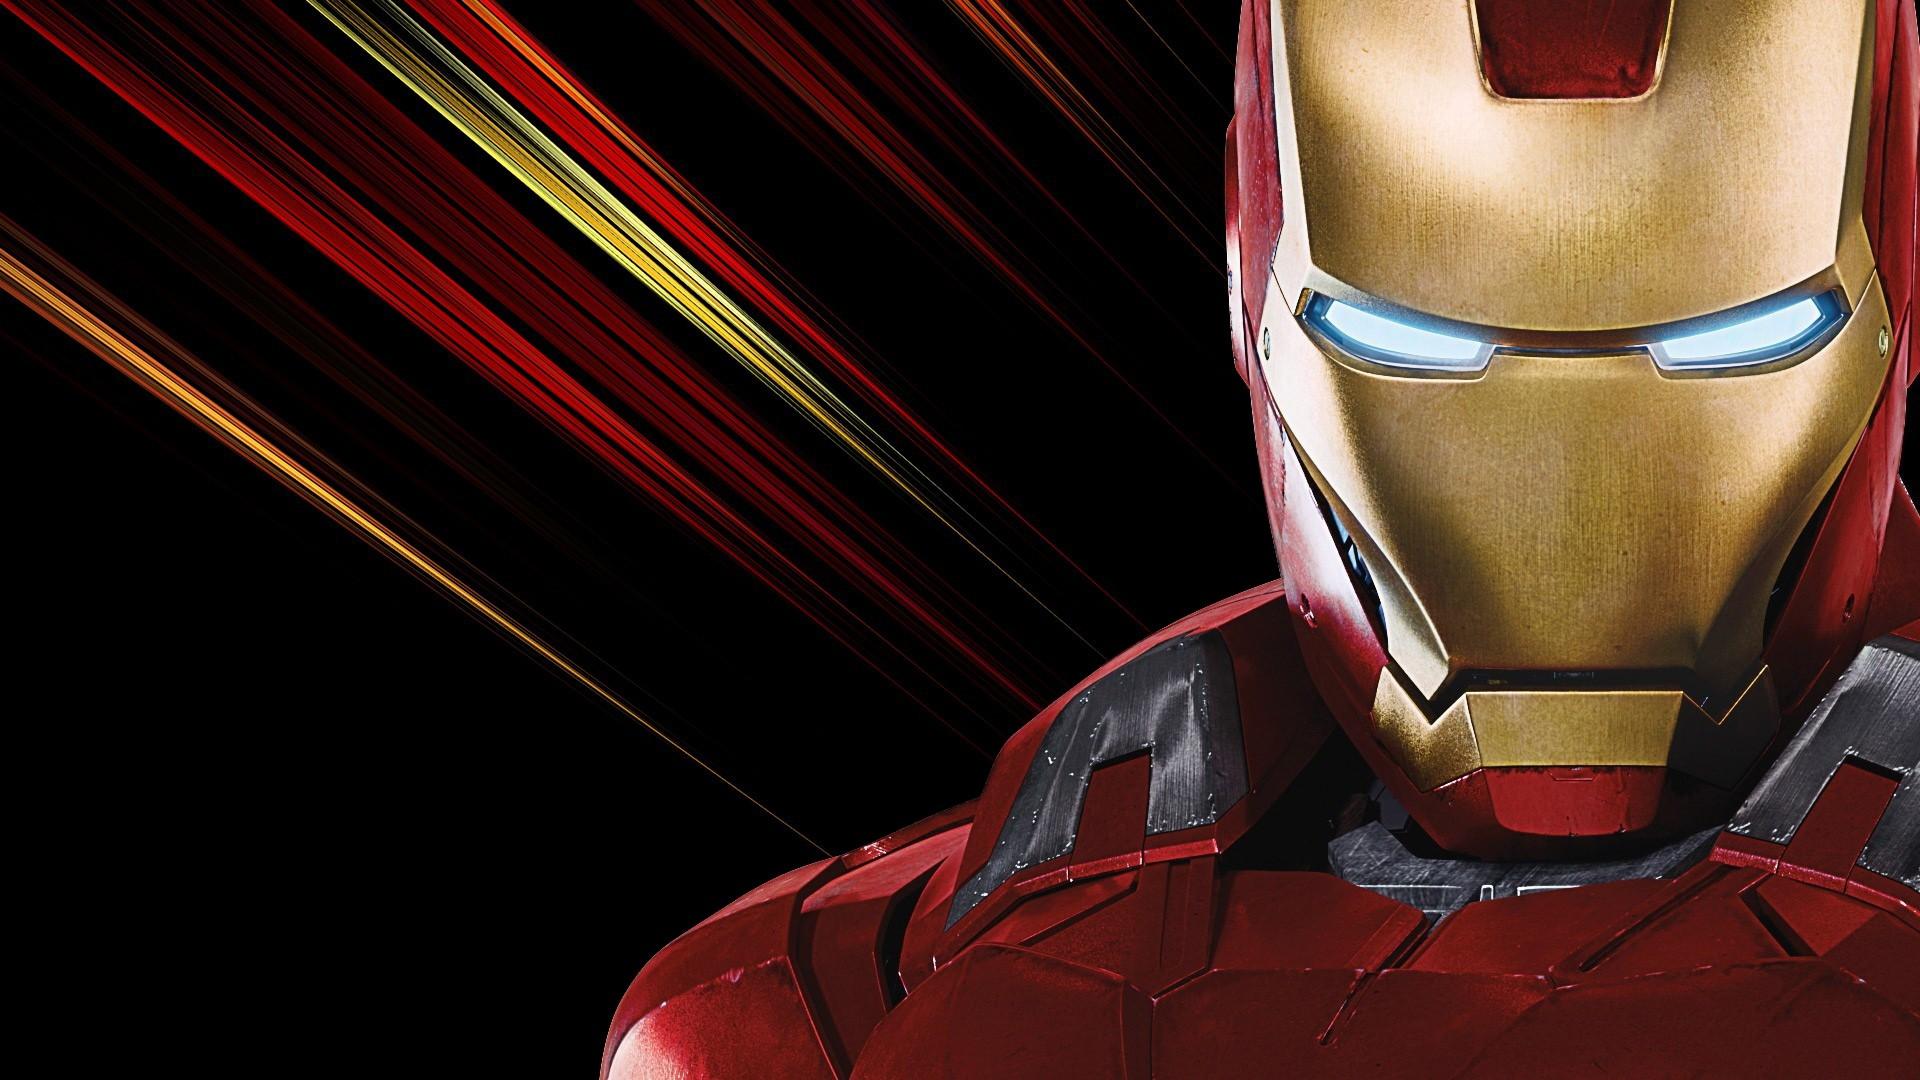 Iron Man Wallpapers Hd Pictures Desktop Background: Iron Man Full HD Wallpaper And Background Image